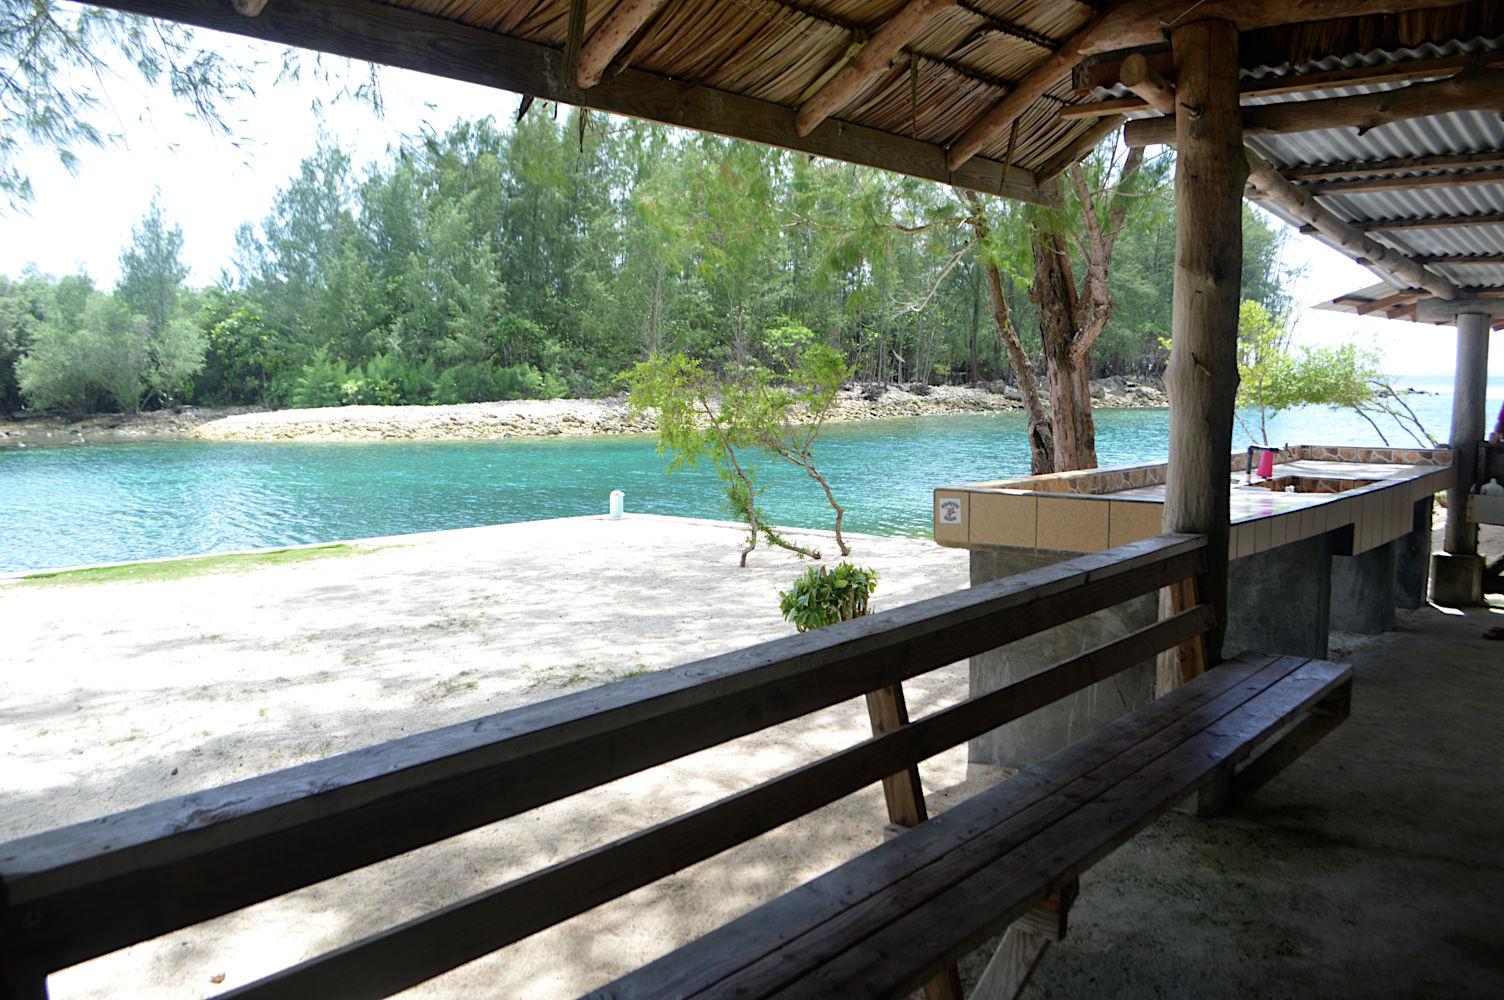 Zona de descanso en el muelle de Kambek